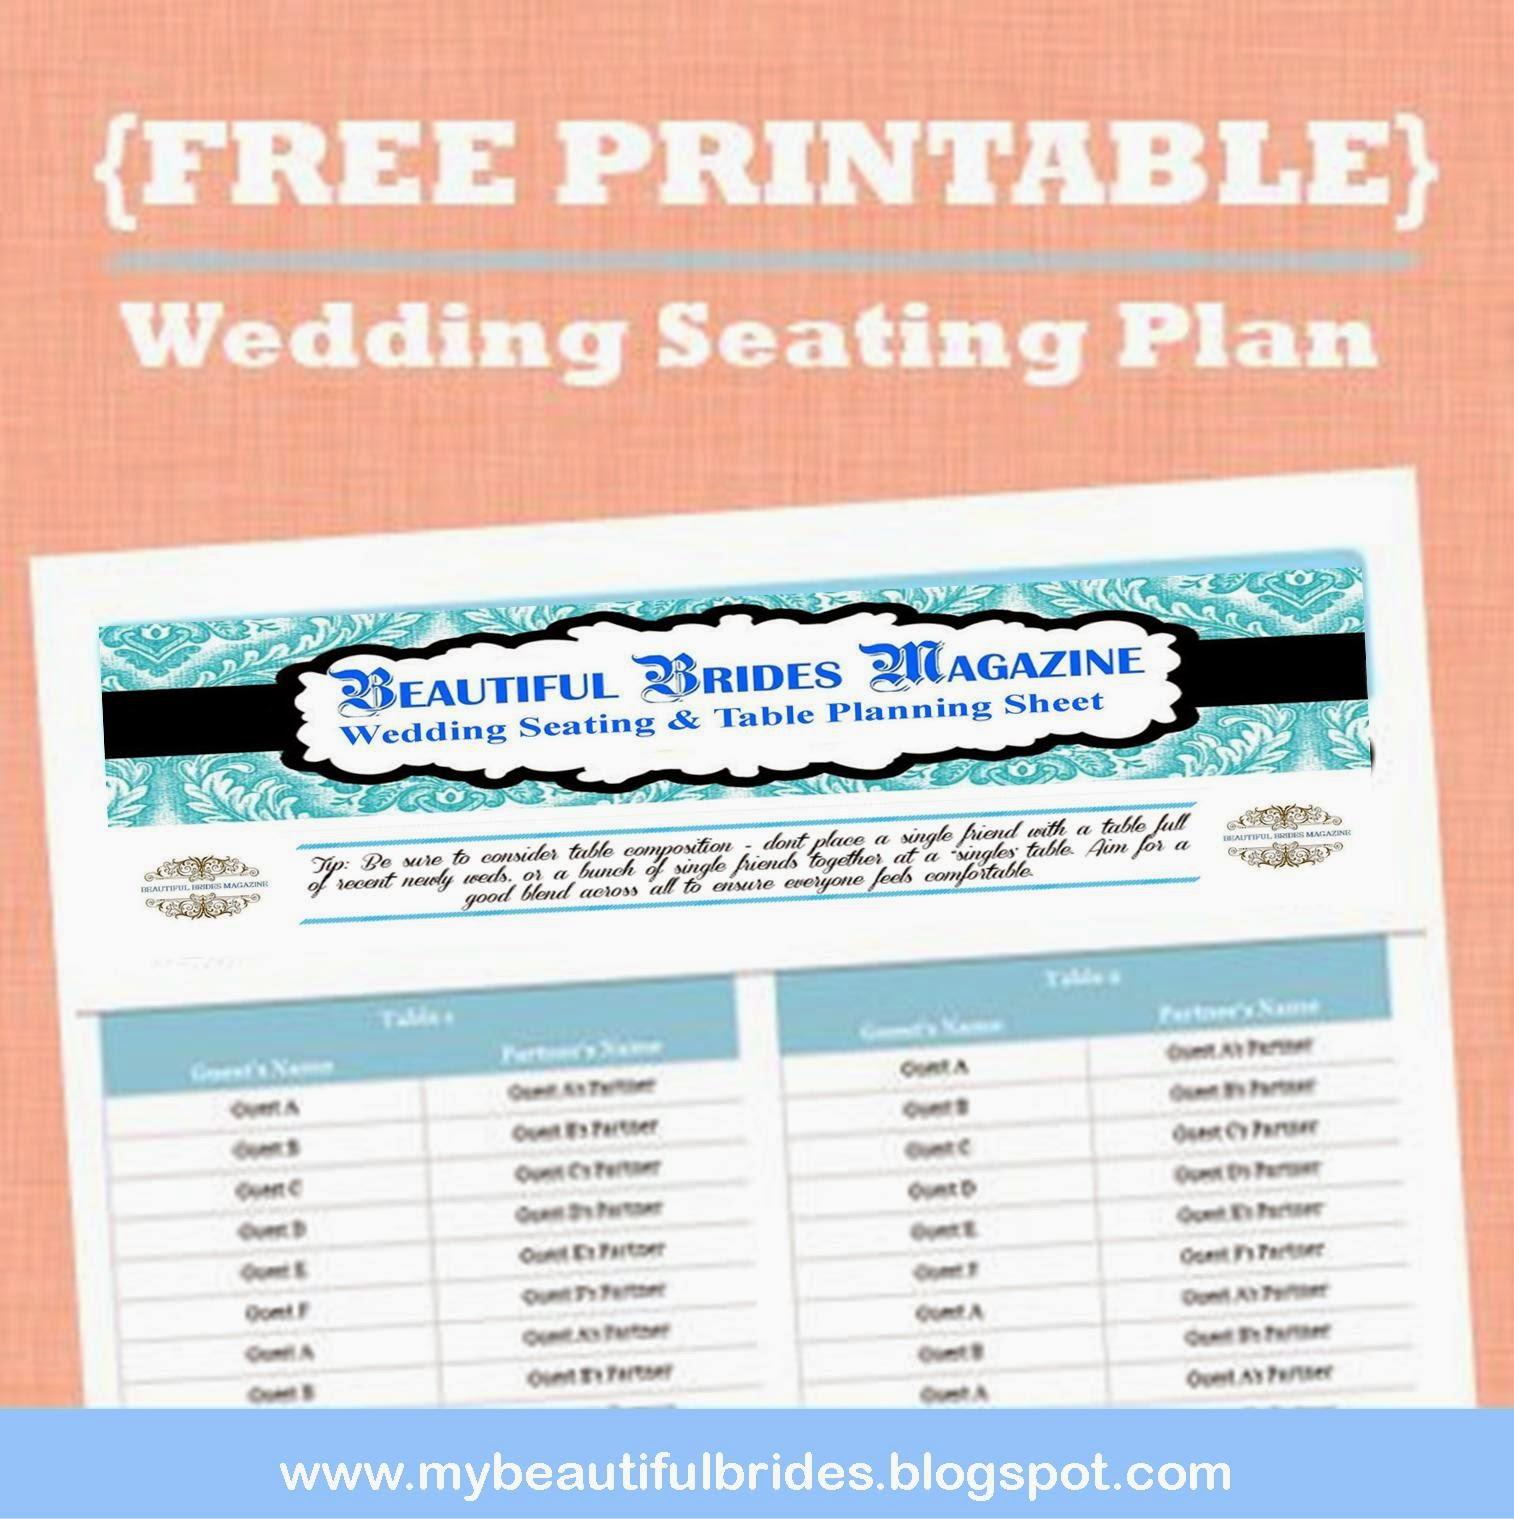 get your free wedding seating table planning sheet workbook